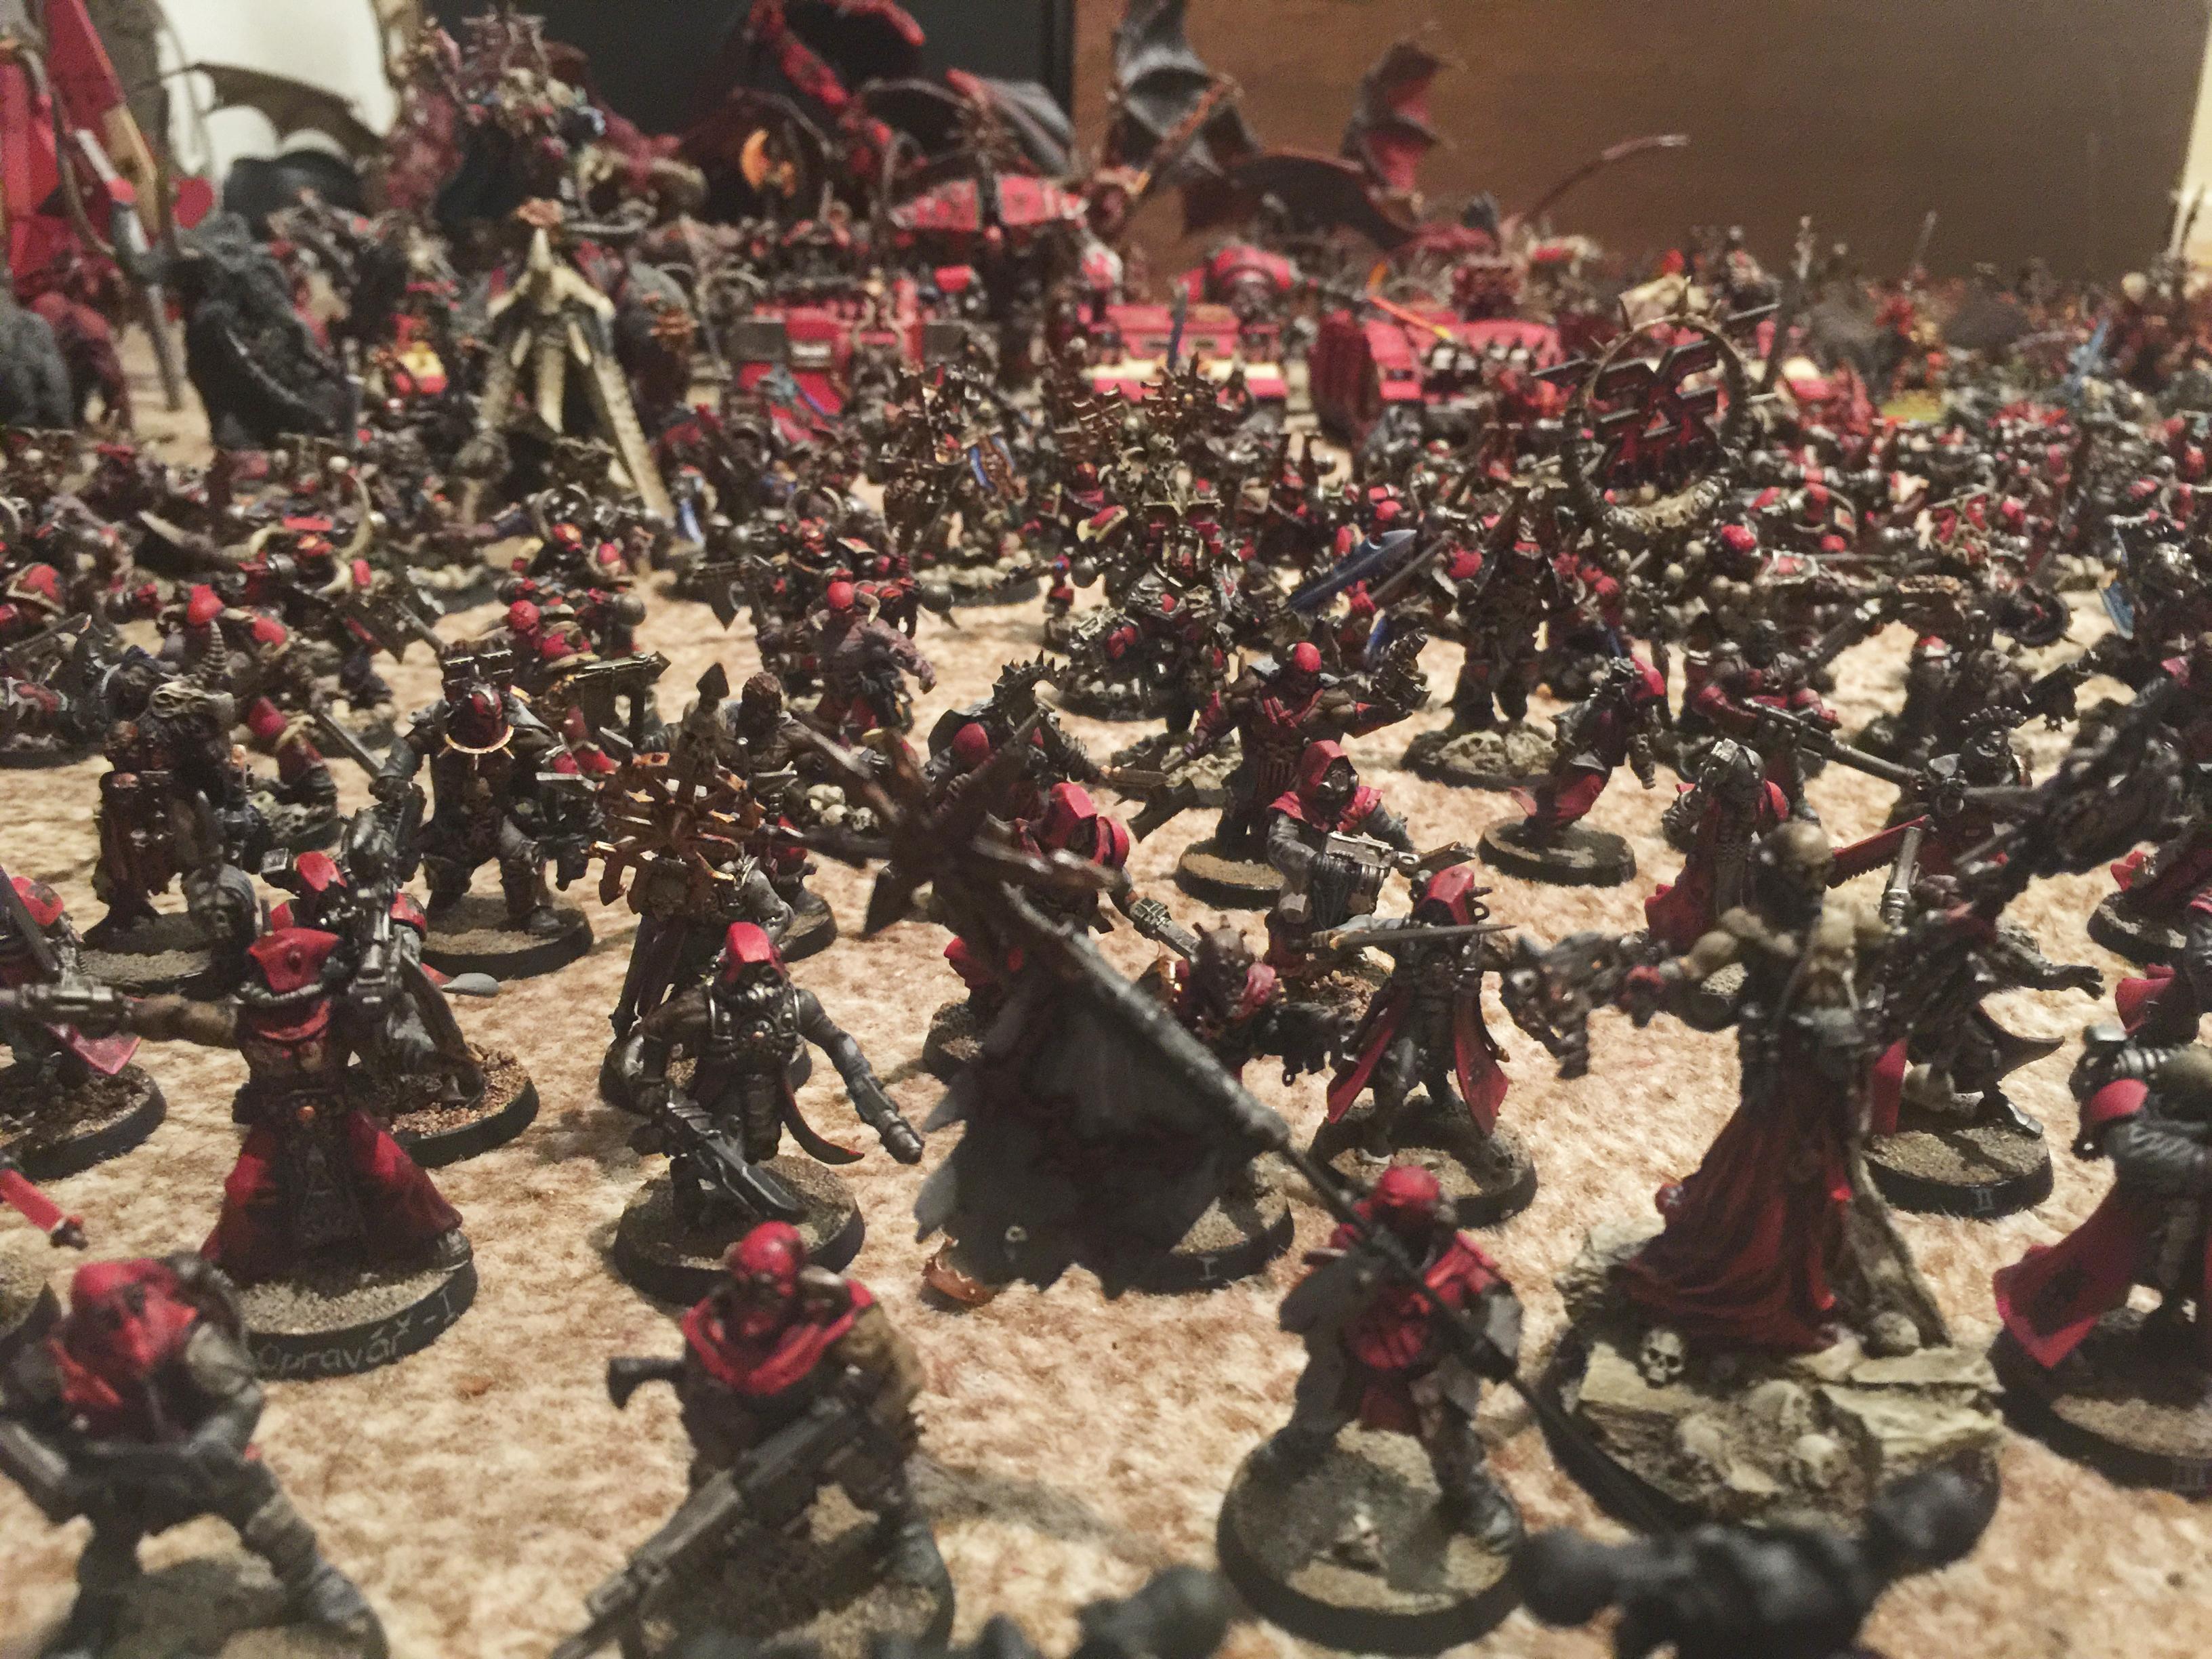 Abaddon The Despoiler, Apocalypse, Army, Chaos Daemons, Chaos Space Marines, Chaos Undivided, Khorne, Renegades, Tzeentch, Warhammer 40,000